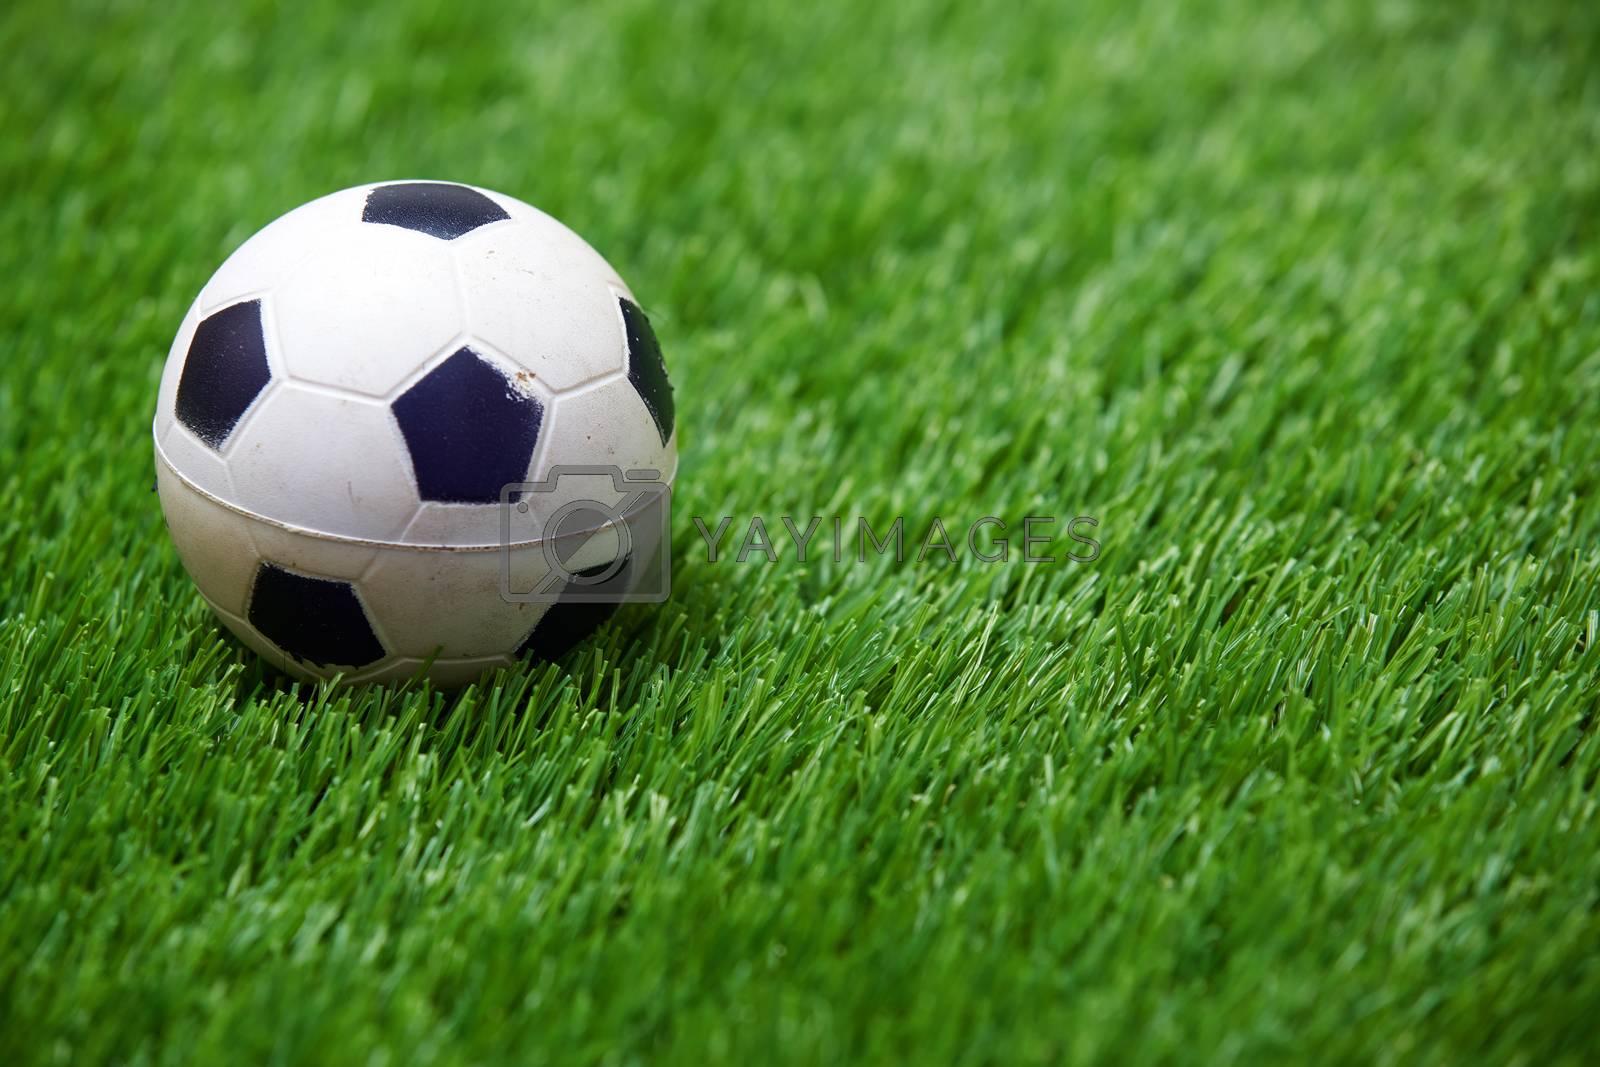 Soccer ball on a grass. Horizontal photo